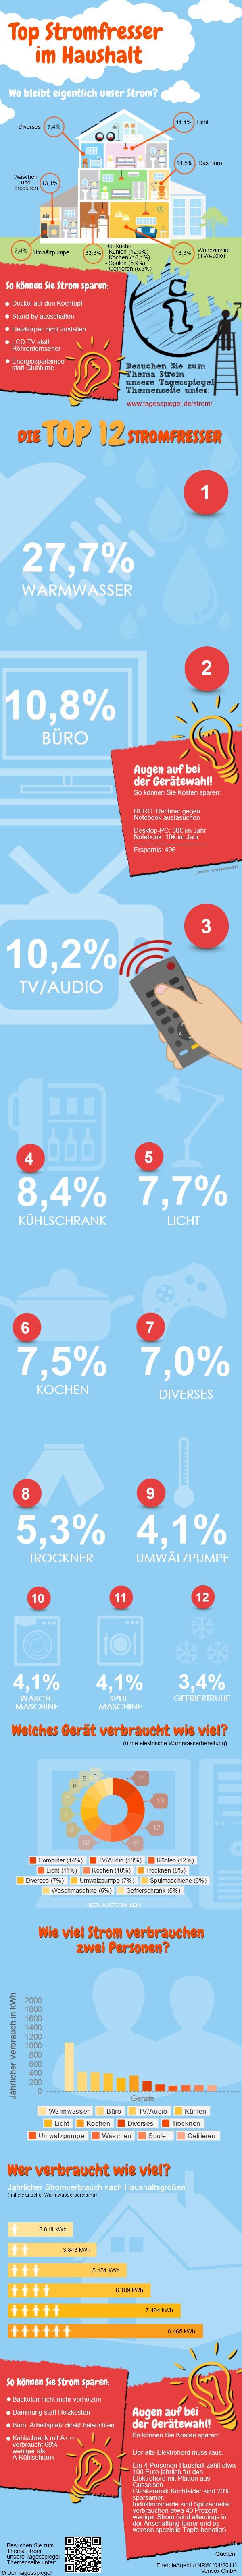 Infografik: Top 12 Stromfresser im Haushalt